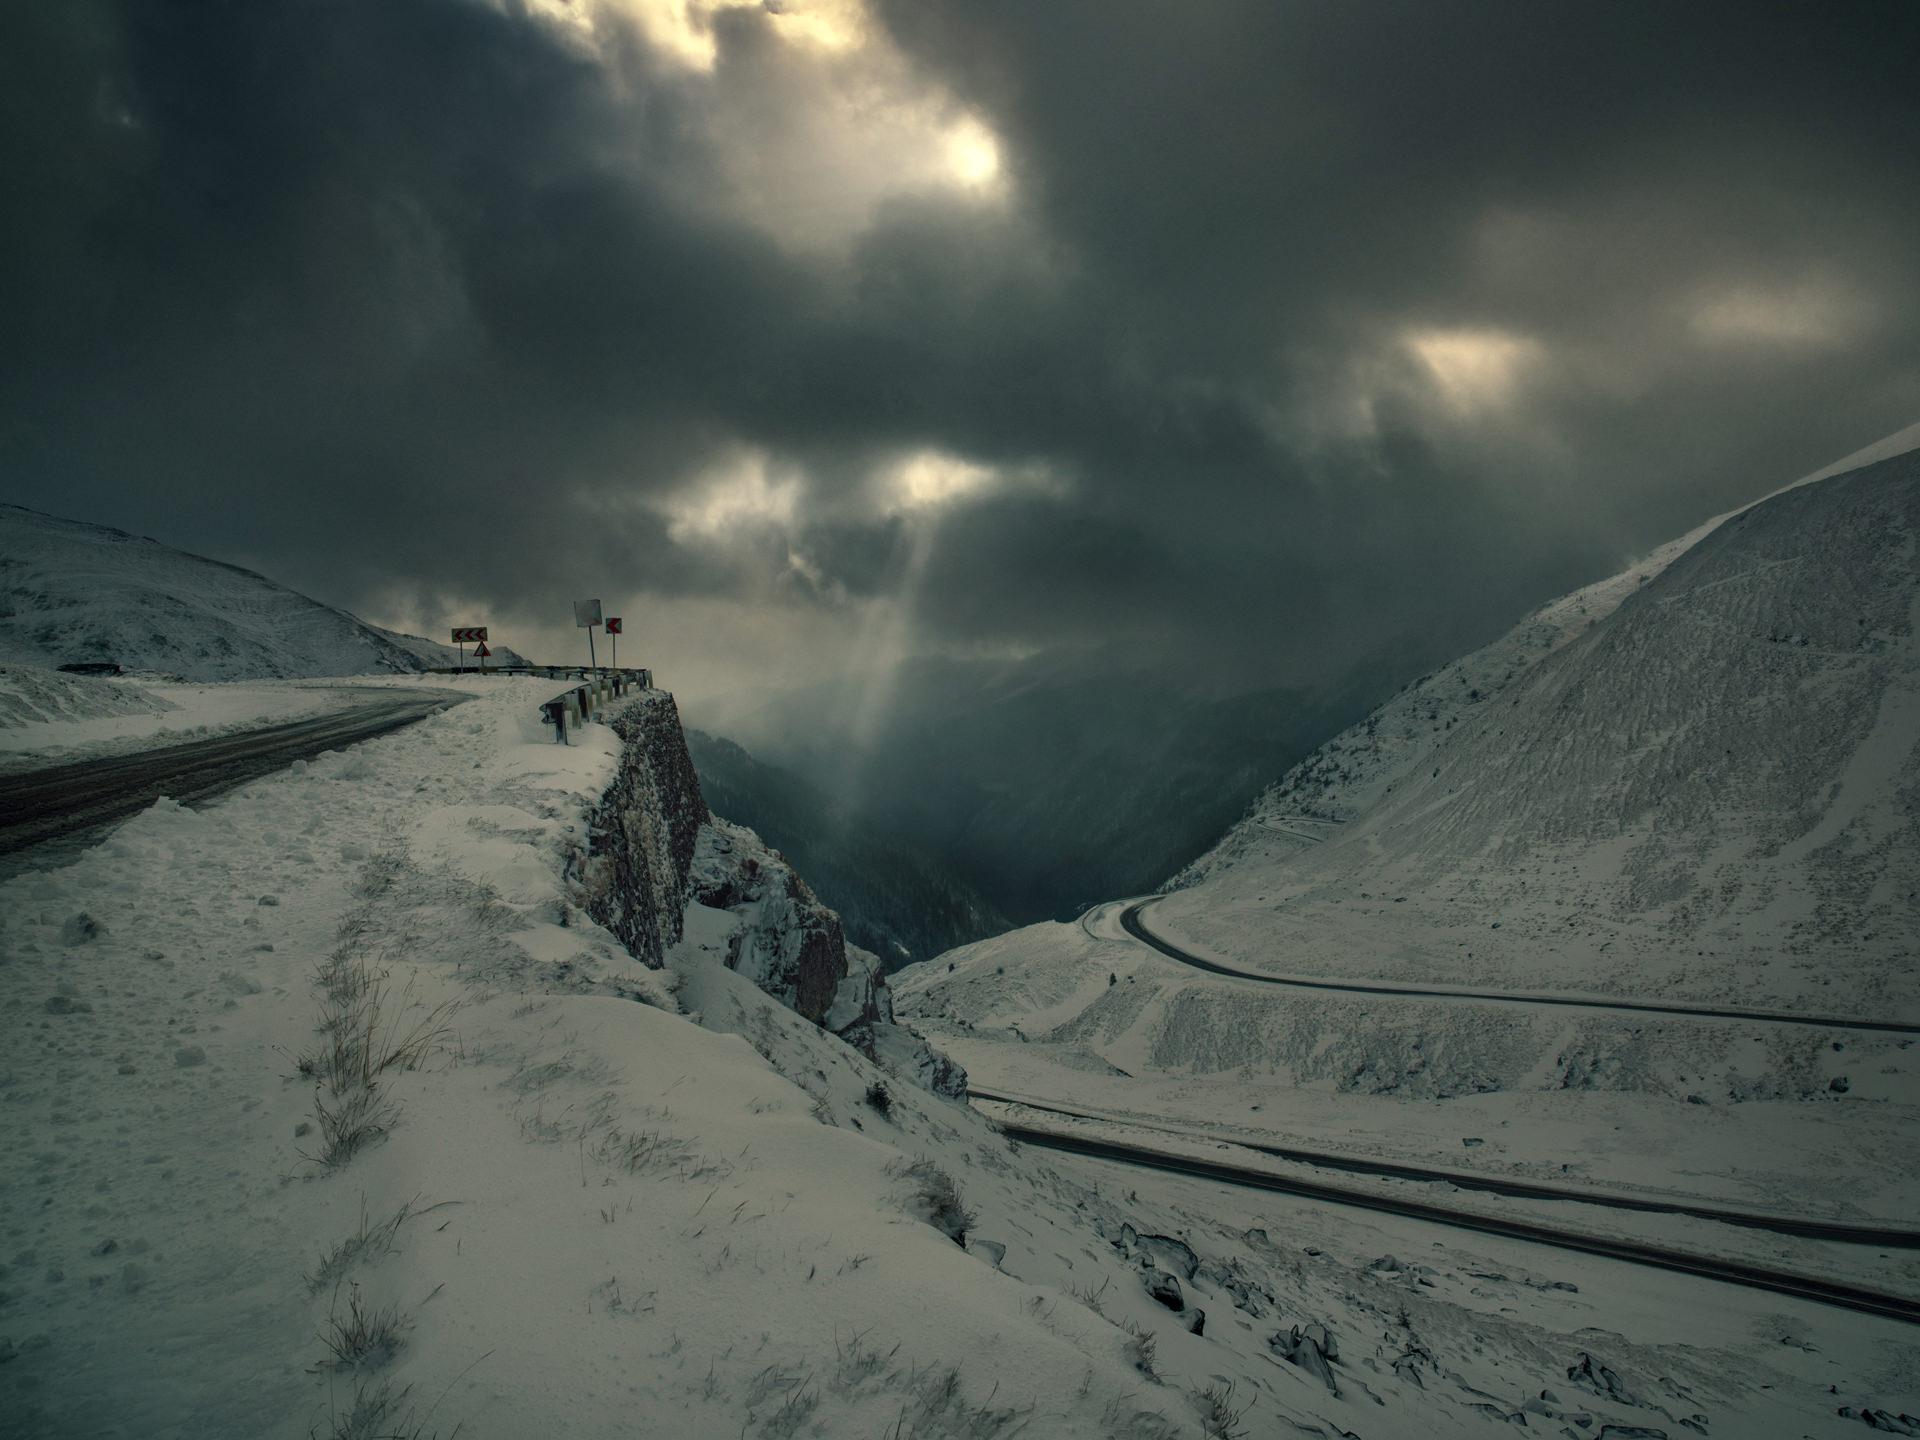 landscape, anke luckmann, romania, mountains, www.ankeluckmann.com, snow